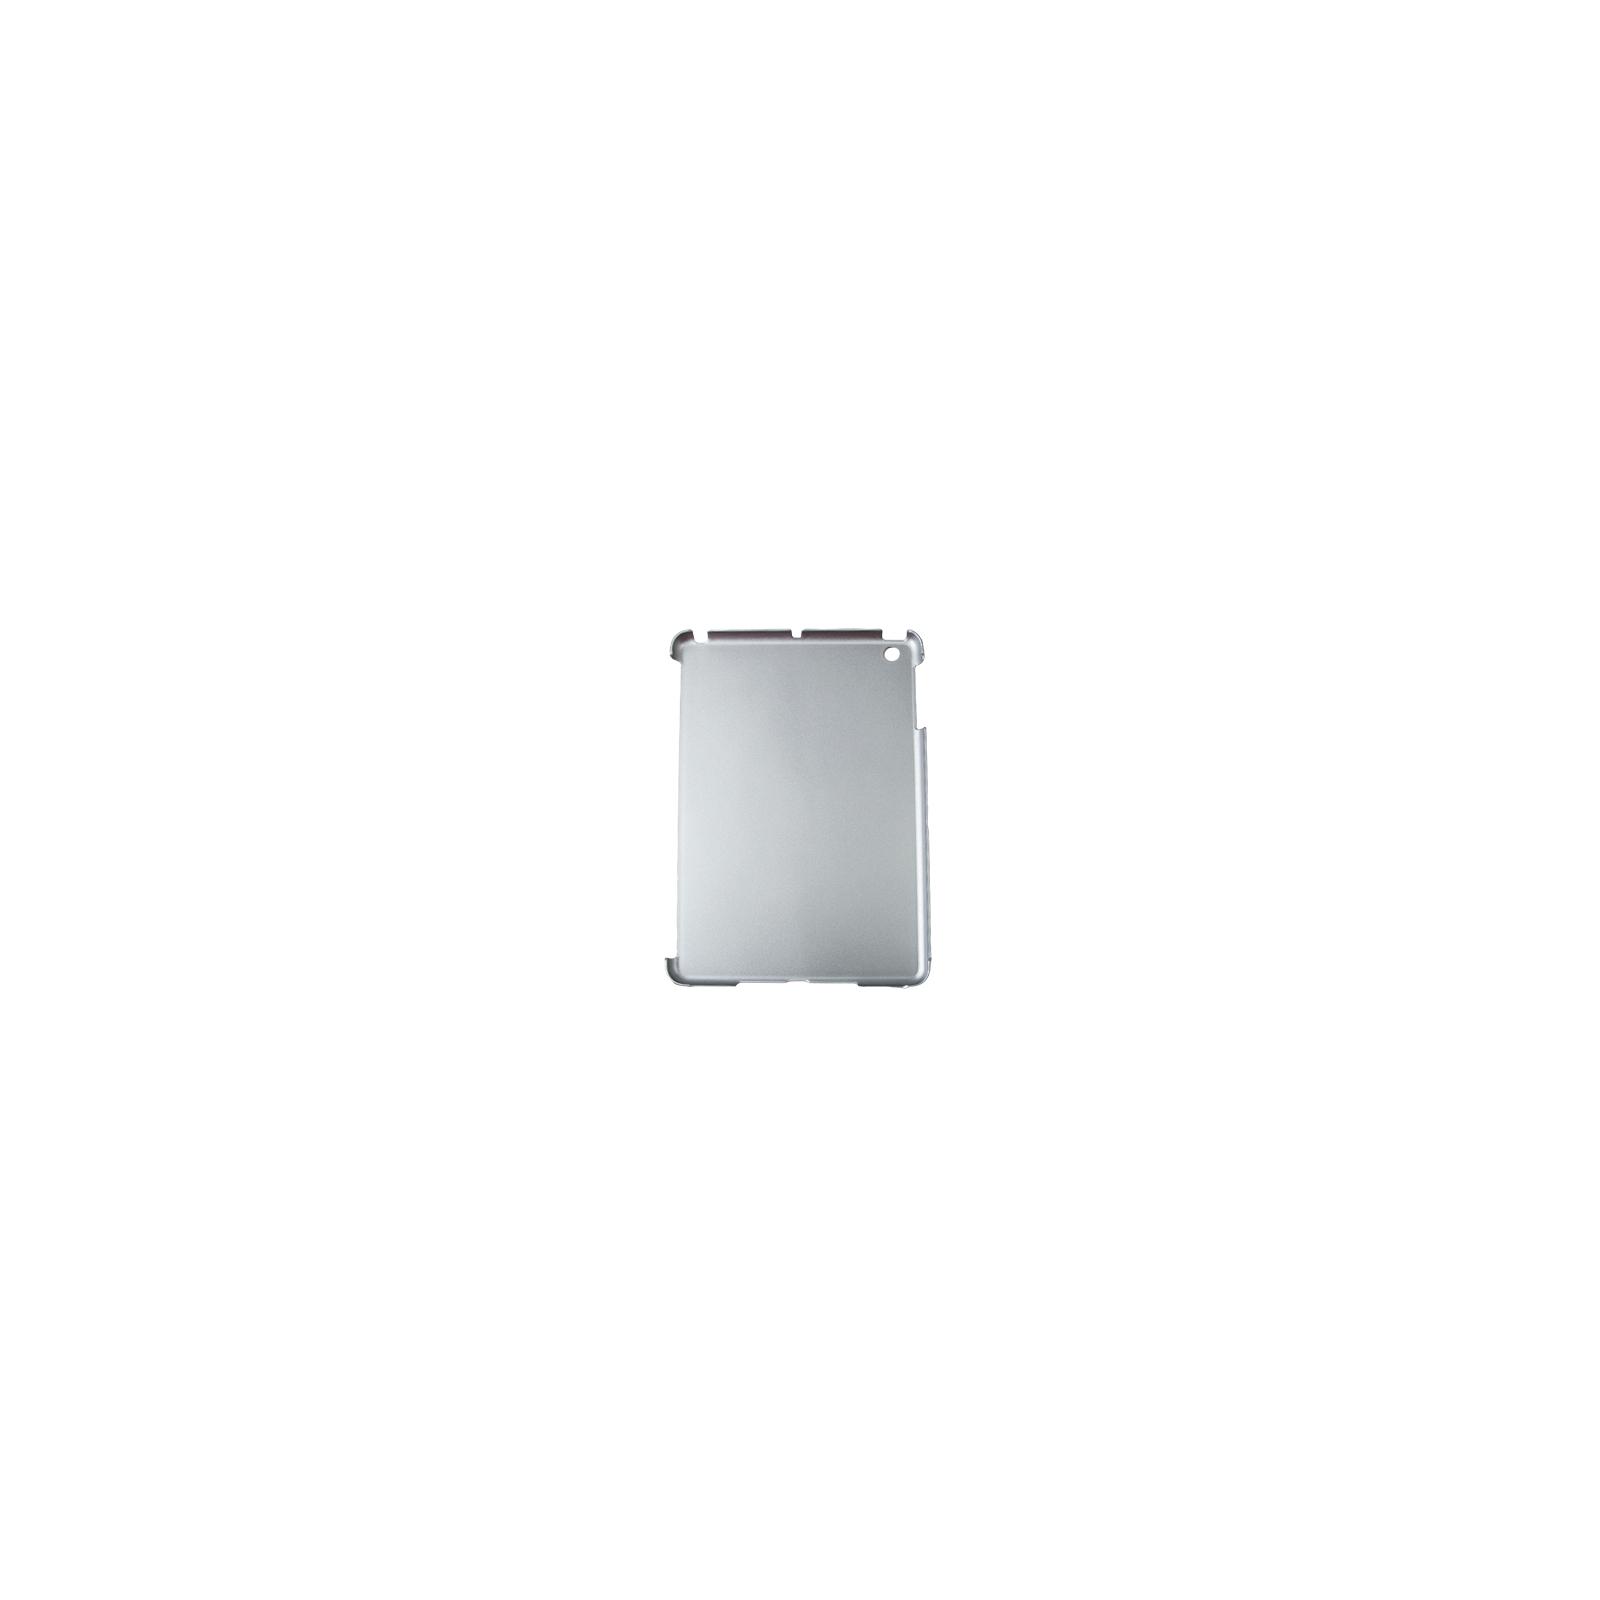 "Чехол для планшета Drobak 7.9"" Apple iPad mini Titanium Panel Black (210244) изображение 2"